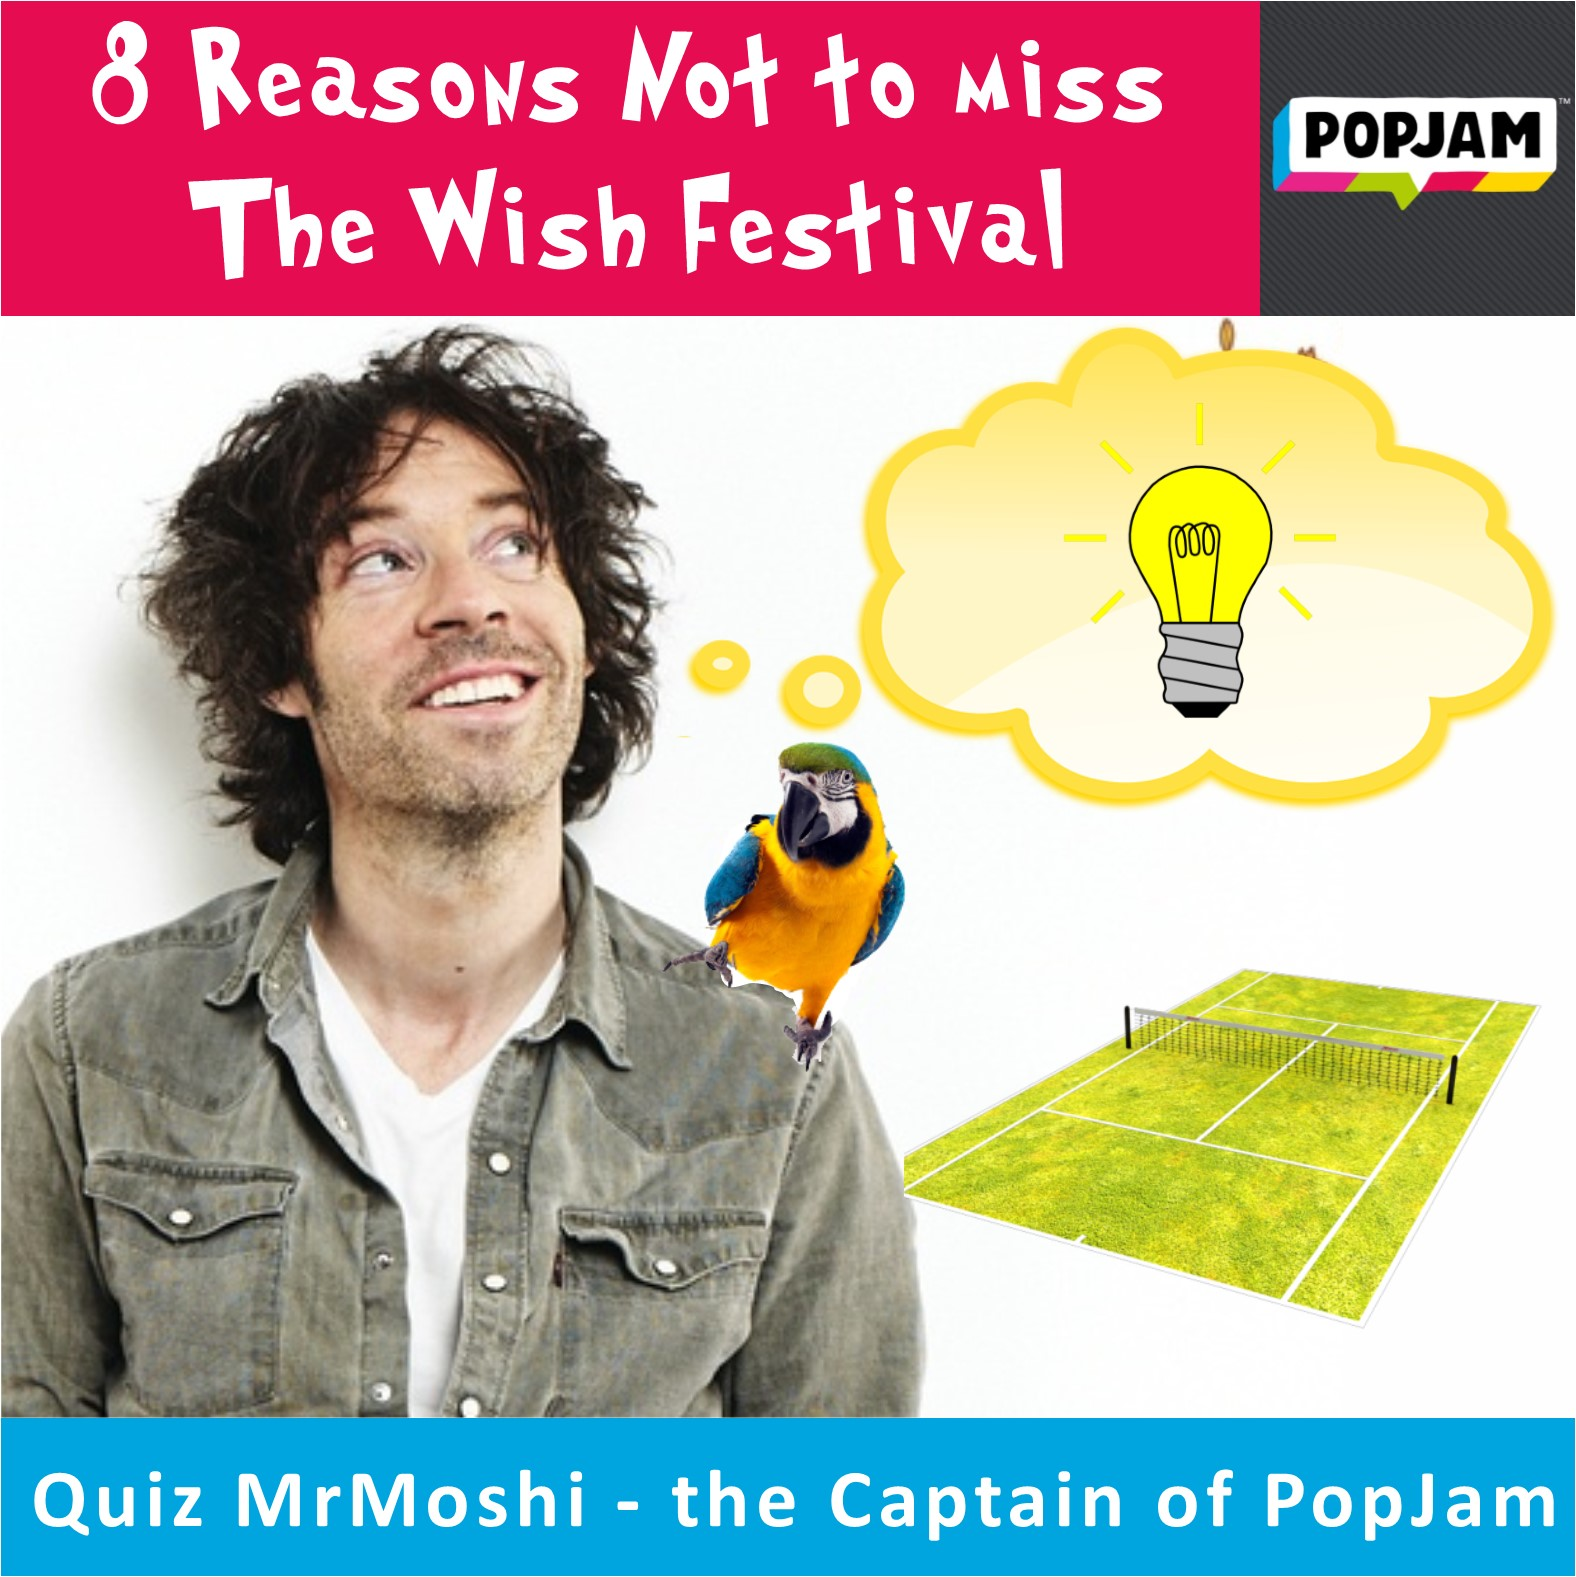 Beatie Wolfe - Wish Festival - 8 reasons - Mr Moshi.jpg